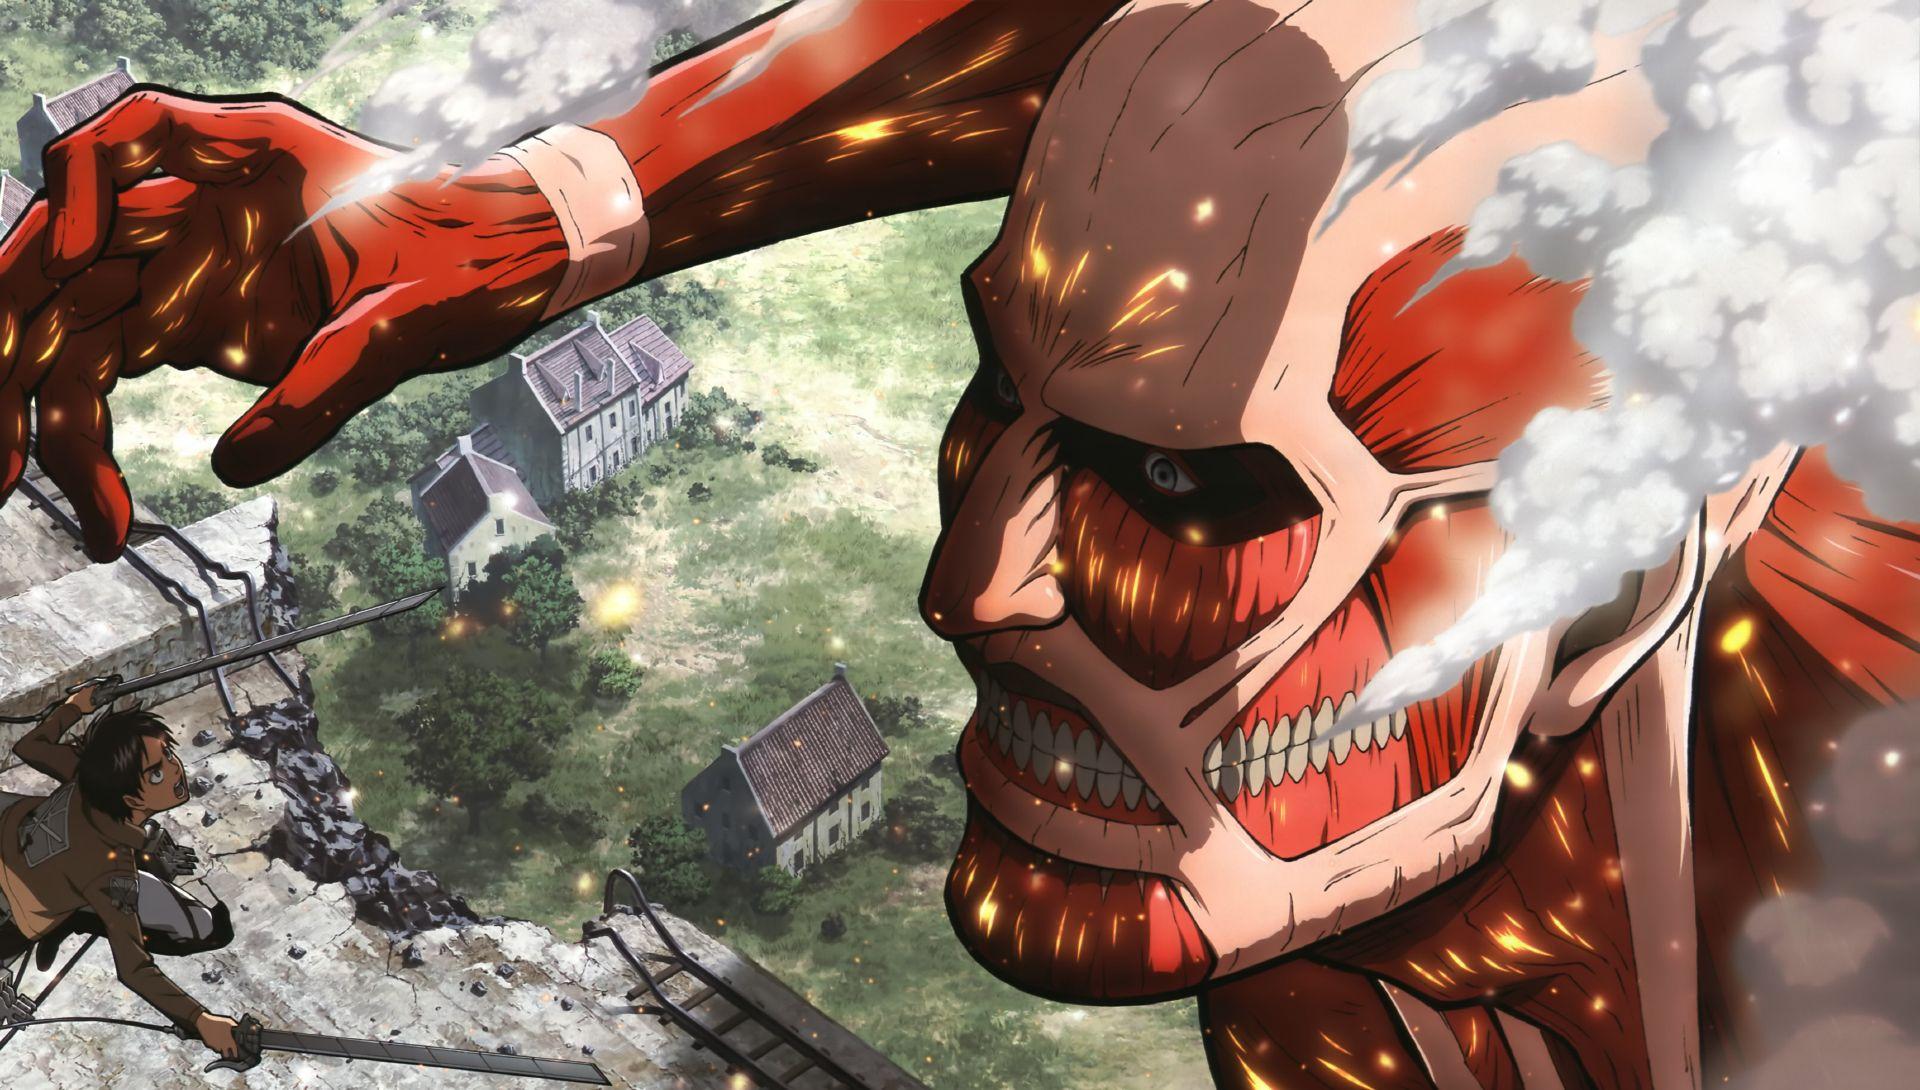 3 Real Places That Resemble Attack On Titan Shingeki No Kyojin